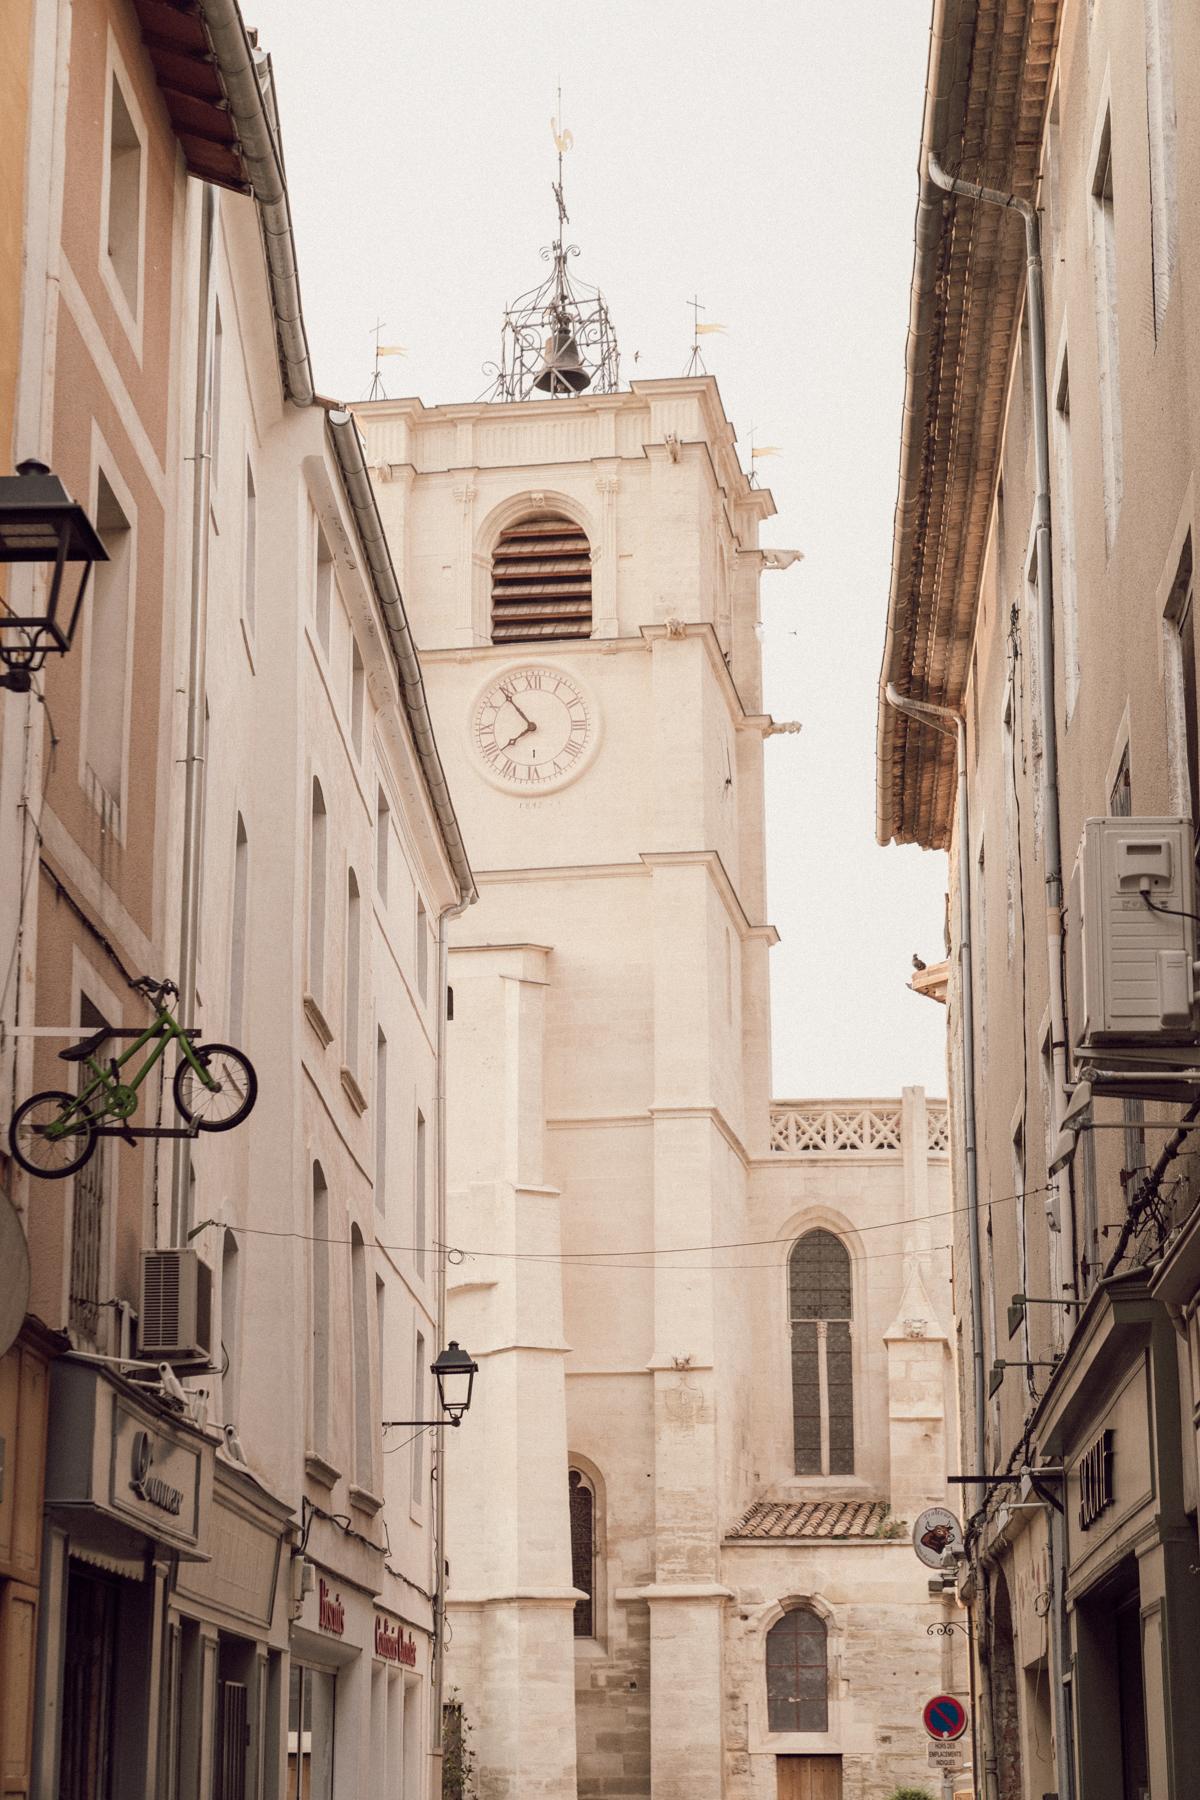 provence-menerbes-oppede-isle-sur-la-sorgue-46